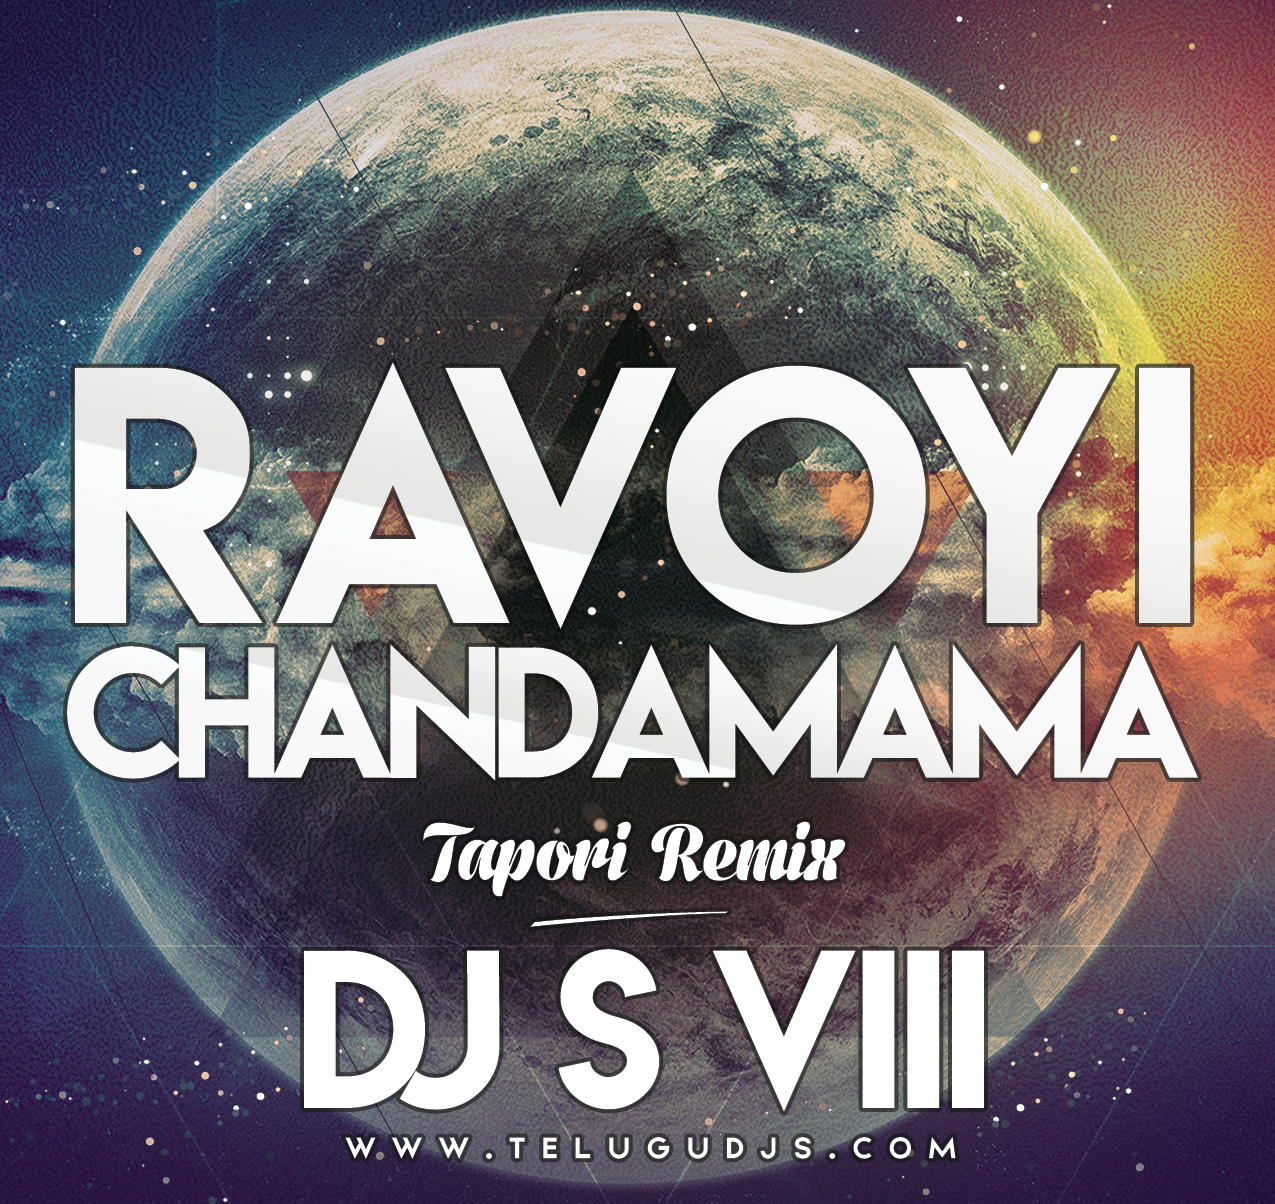 Ravoyi Chandamama remix dj sai naresh dj s viii